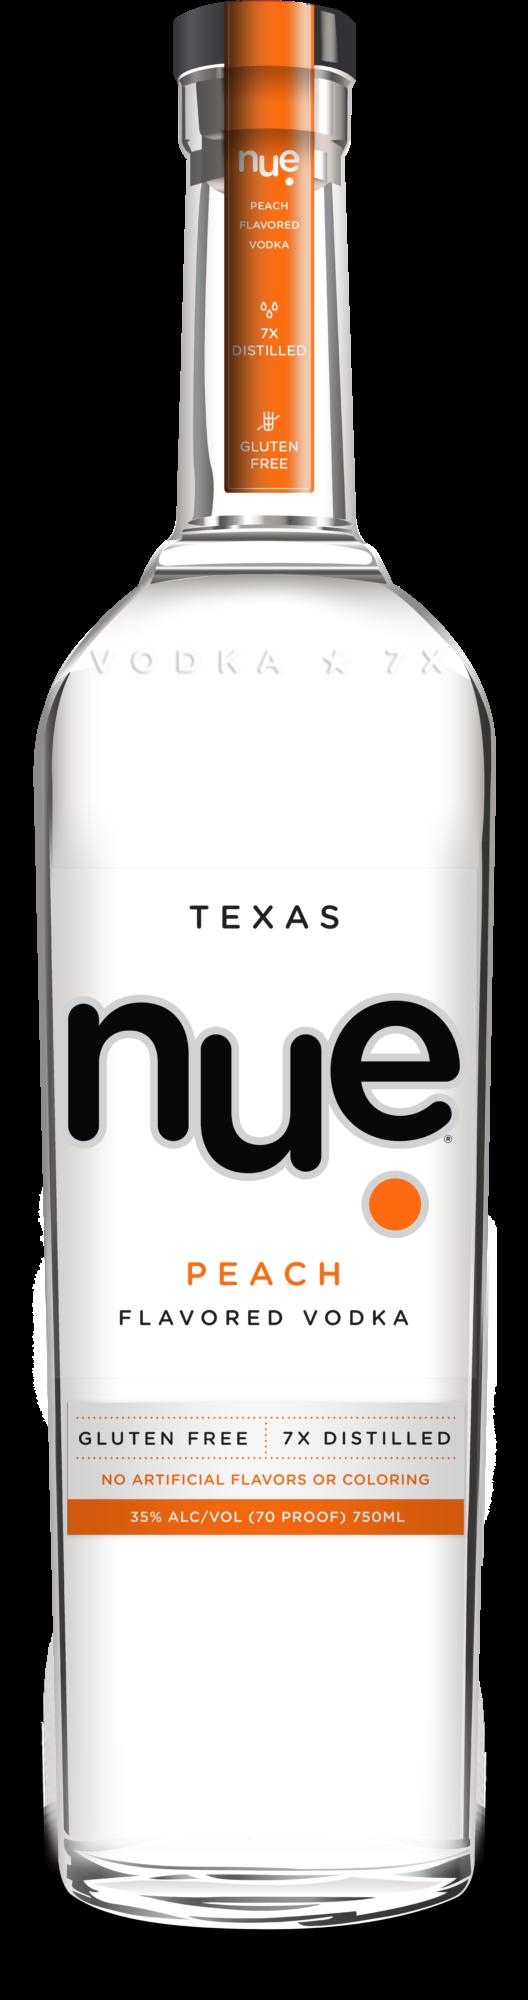 Bottle of nue peach vodka